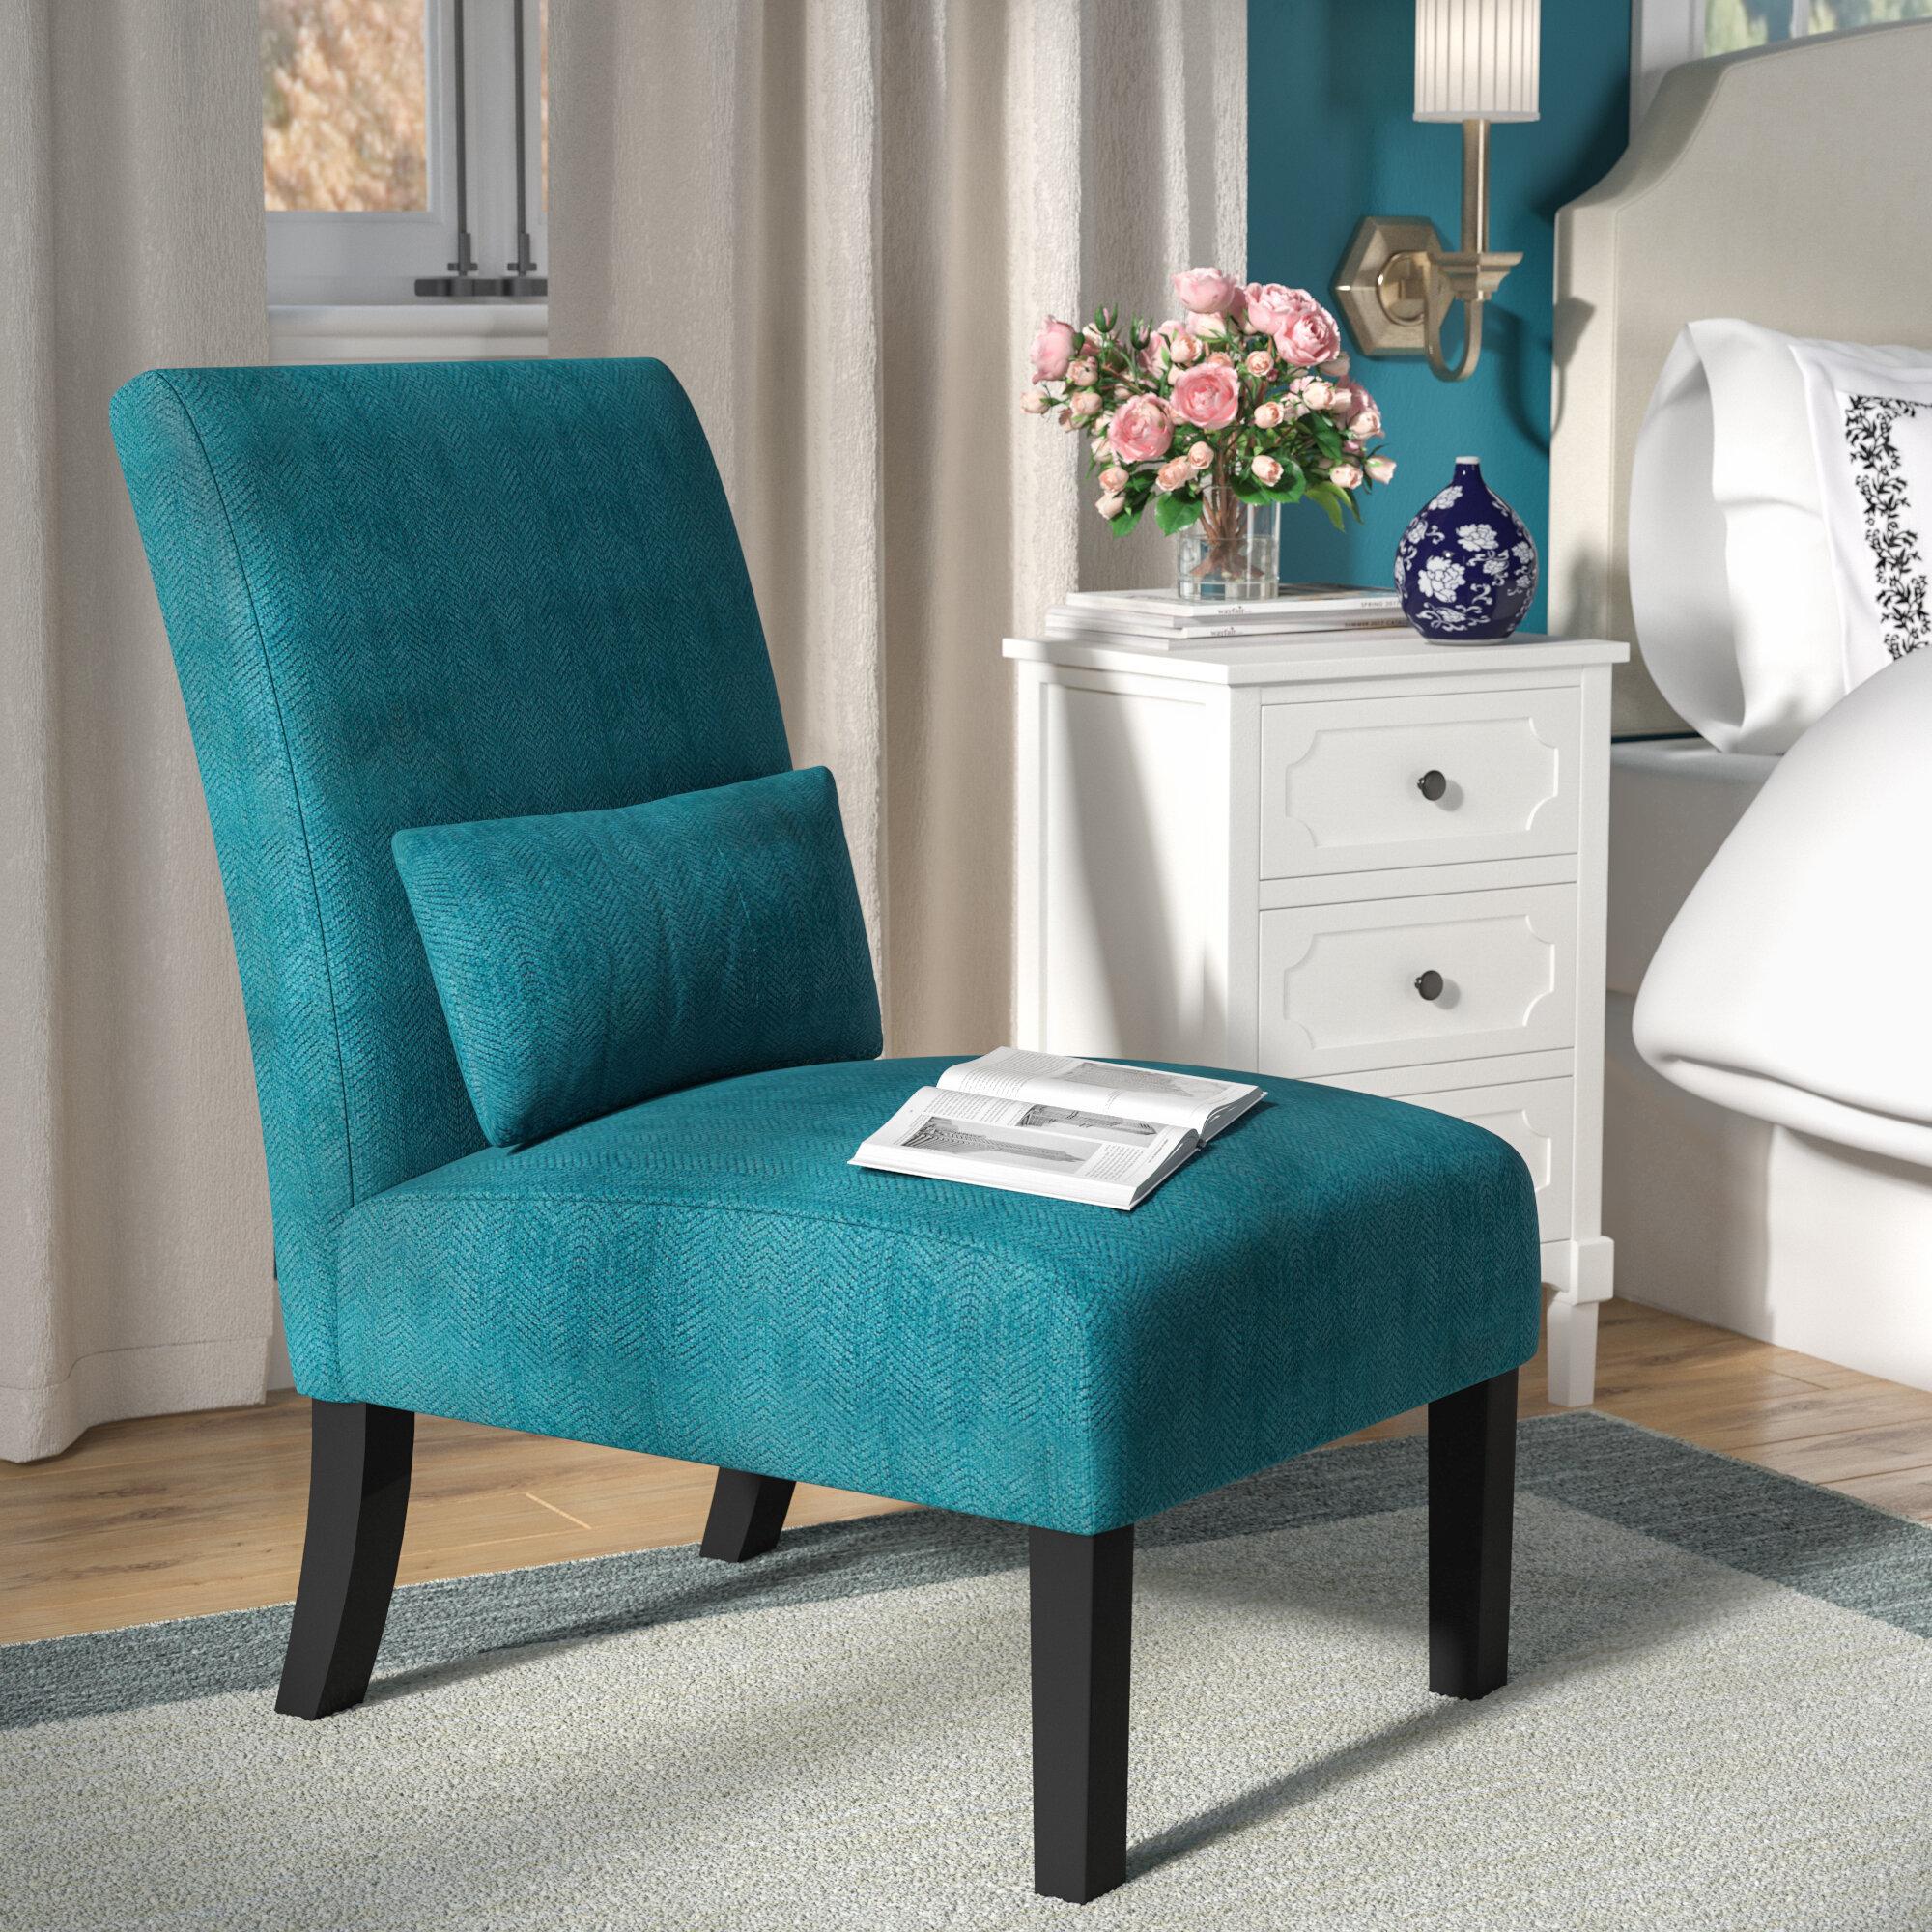 Zipcode Design Randi Slipper Chair & Reviews | Wayfair